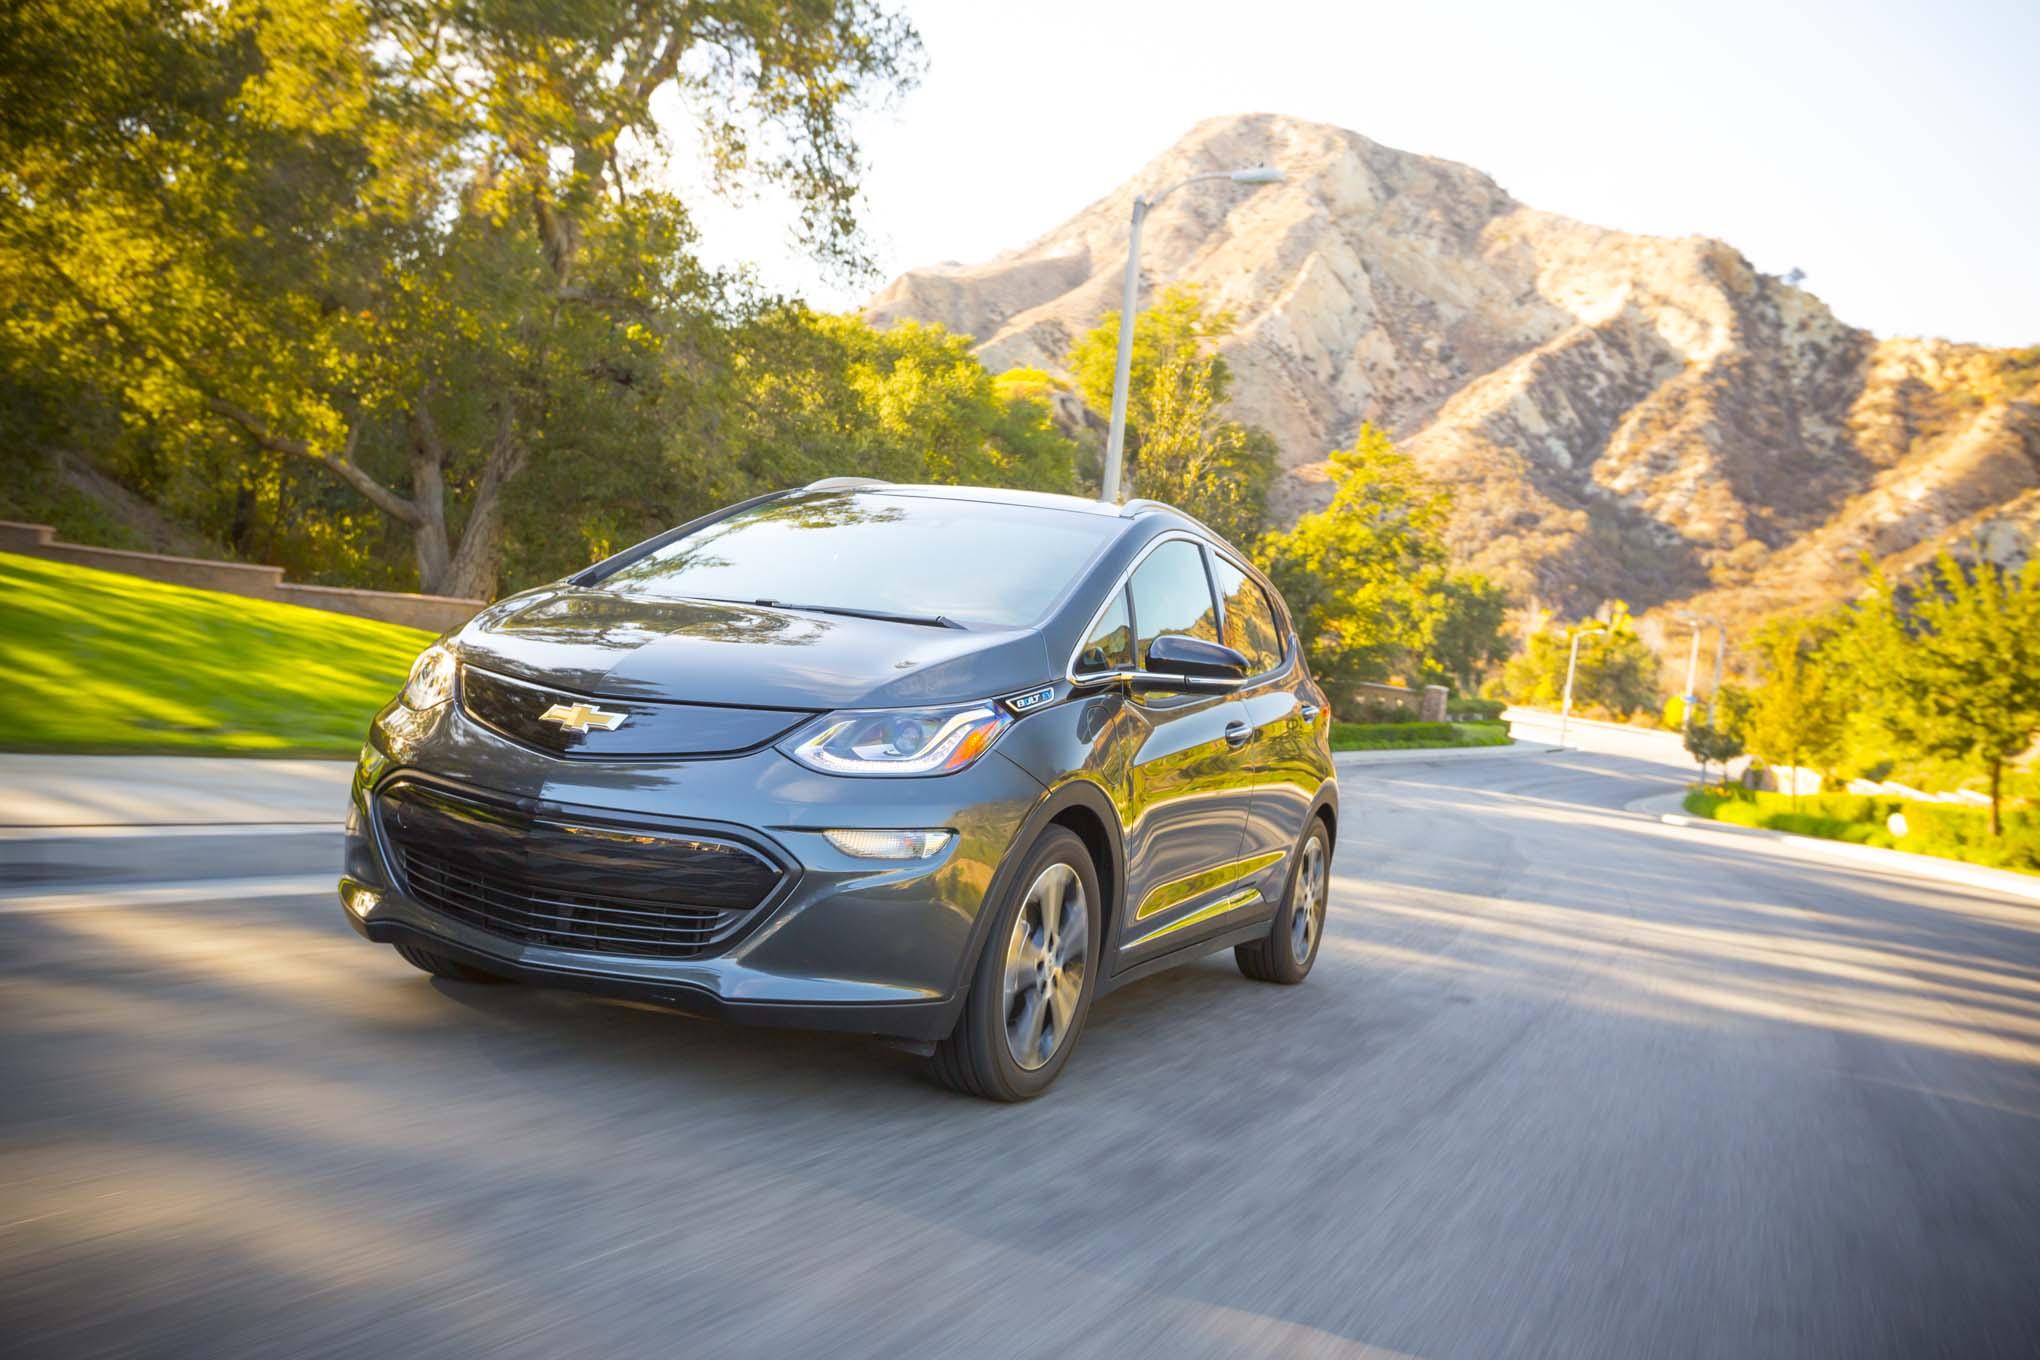 2017 Chevrolet Bolt EV Premier Front Three Quarter In Motion 63